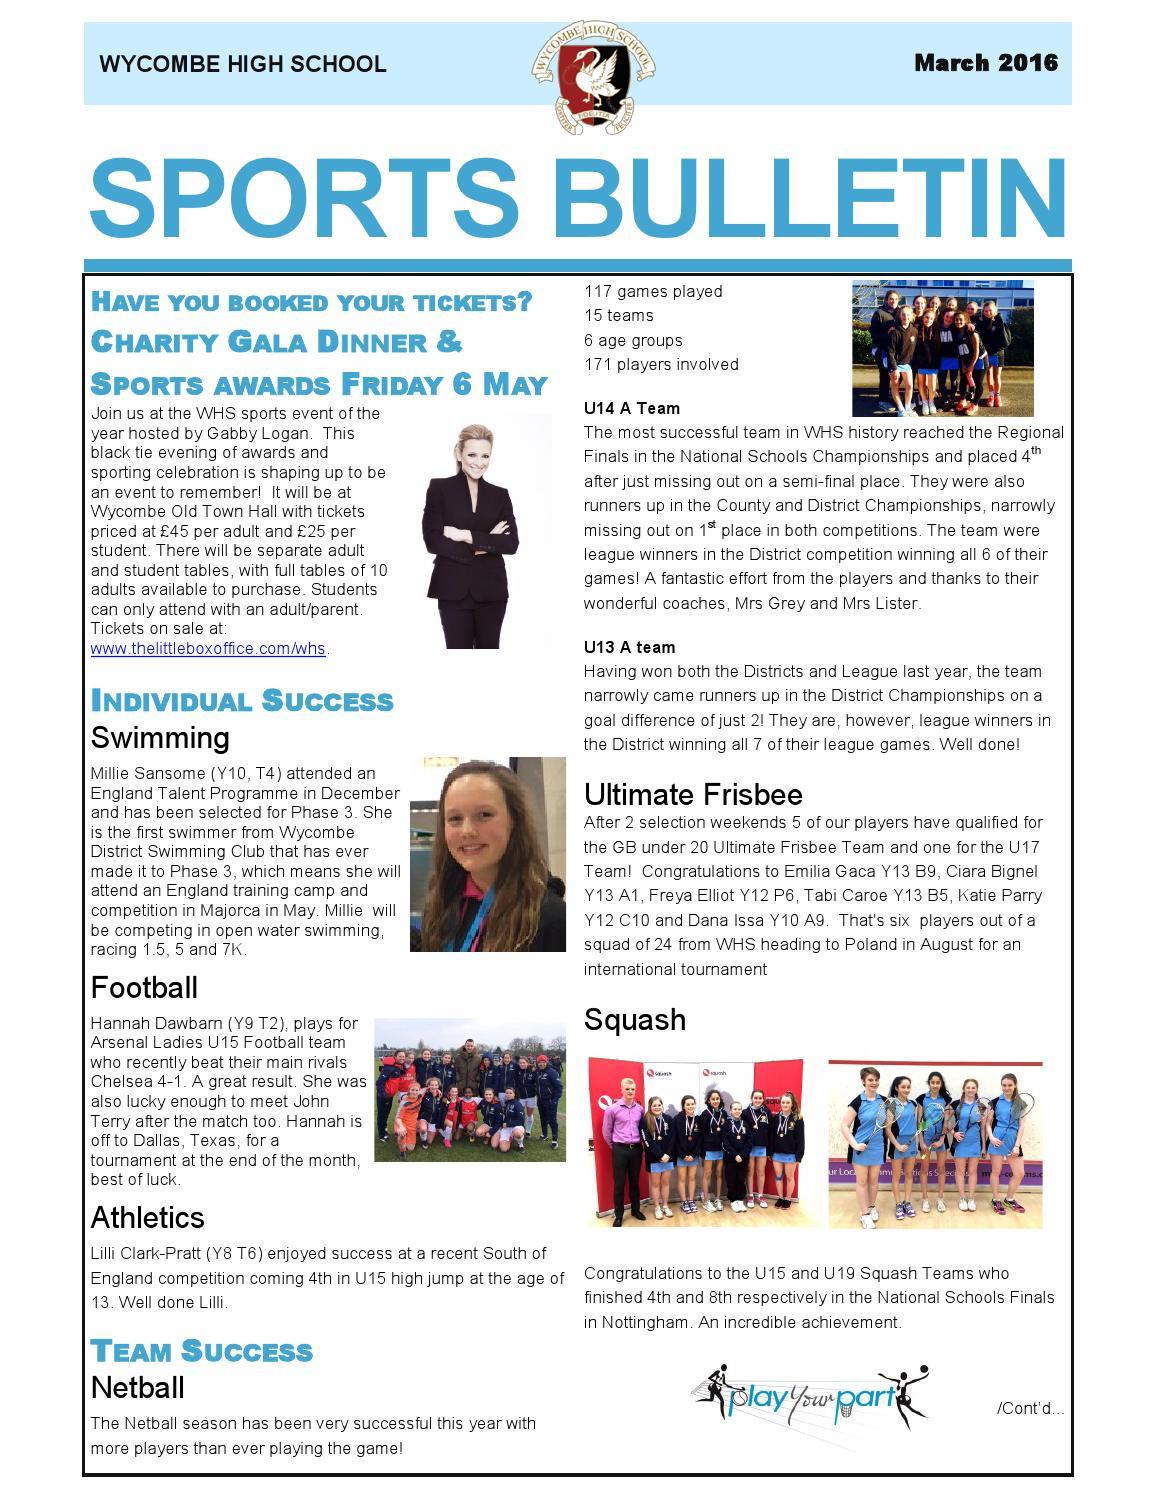 Sports bulletin march by Wycombe High School - issuu